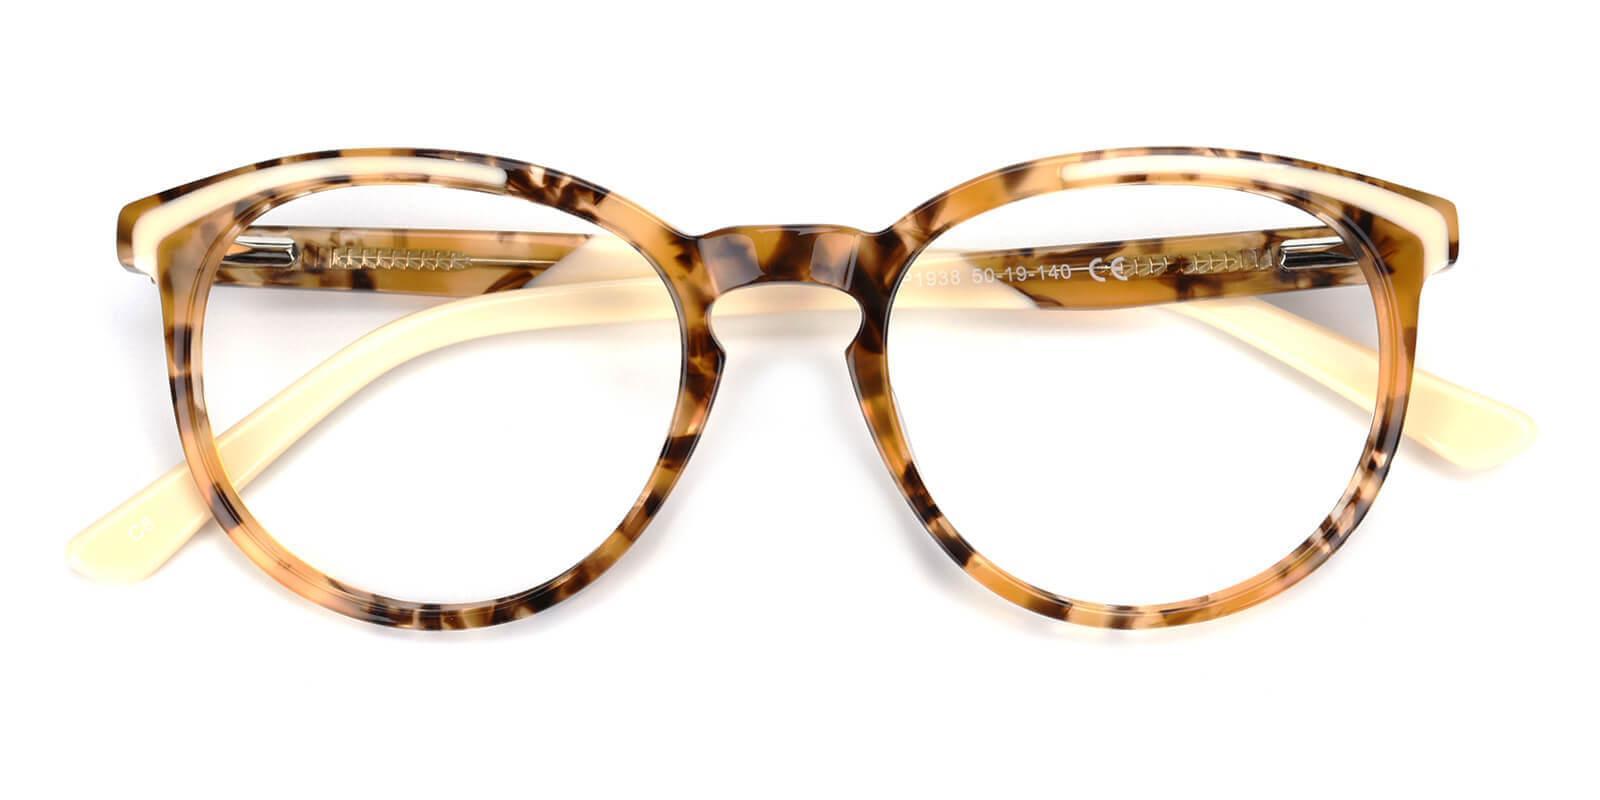 Deborah-Yellow-Oval-Acetate-Eyeglasses-detail